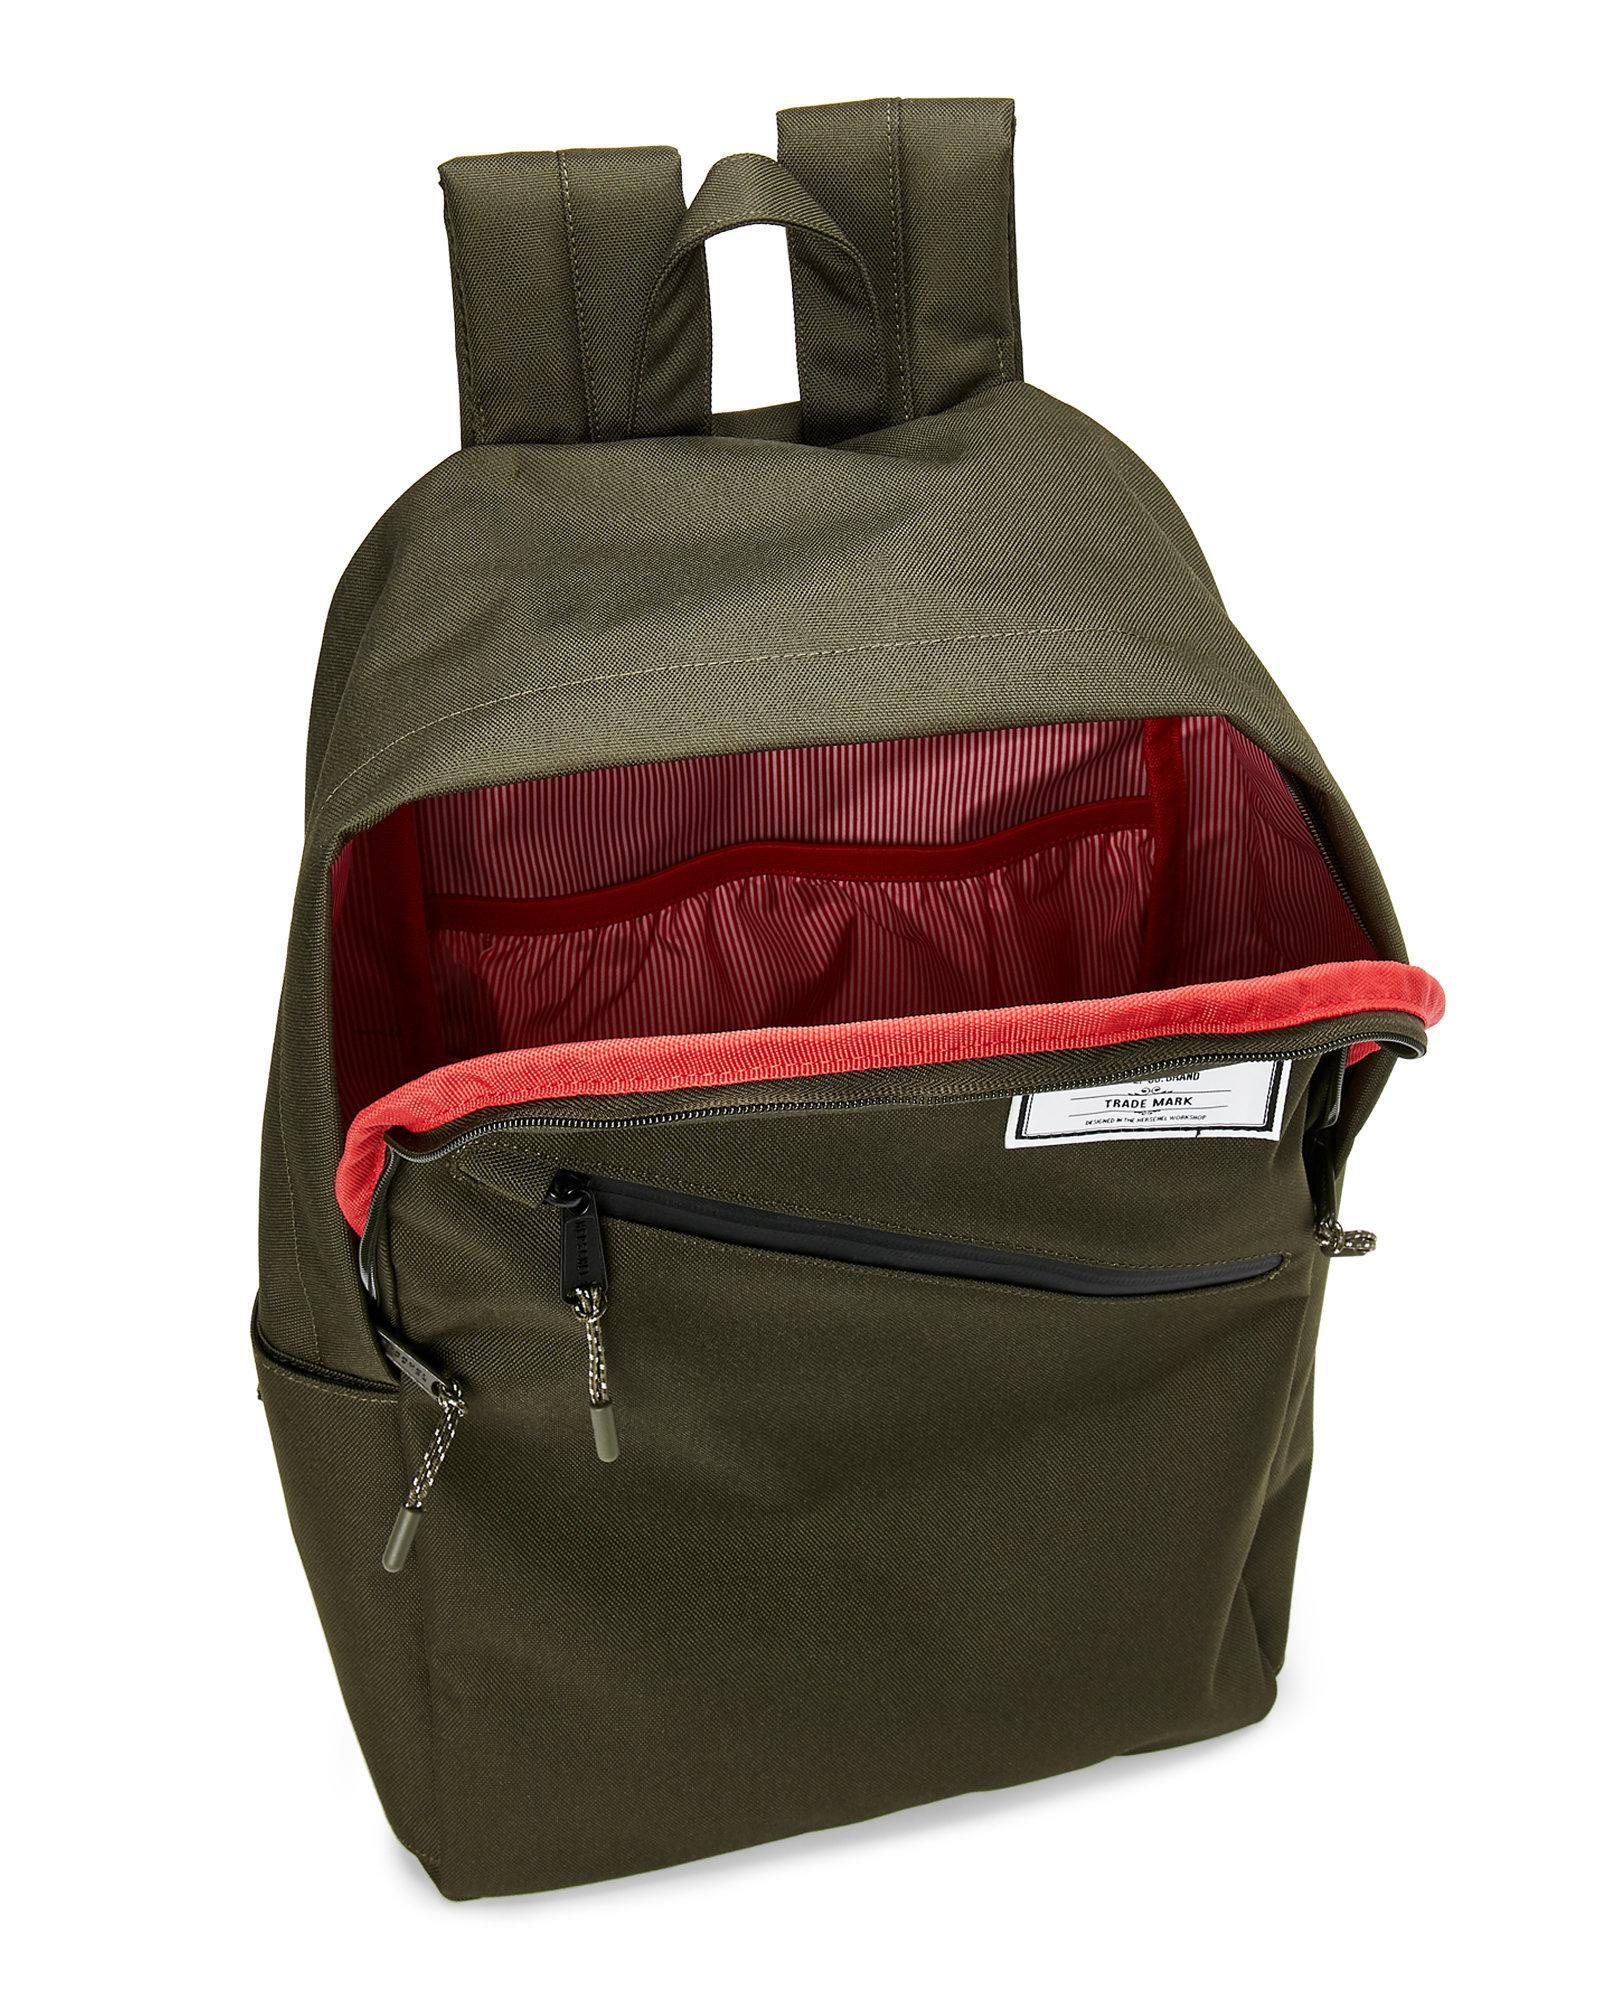 bf837900caf Lyst - Herschel Supply Co. Forest Parker Laptop Backpack in Green ...